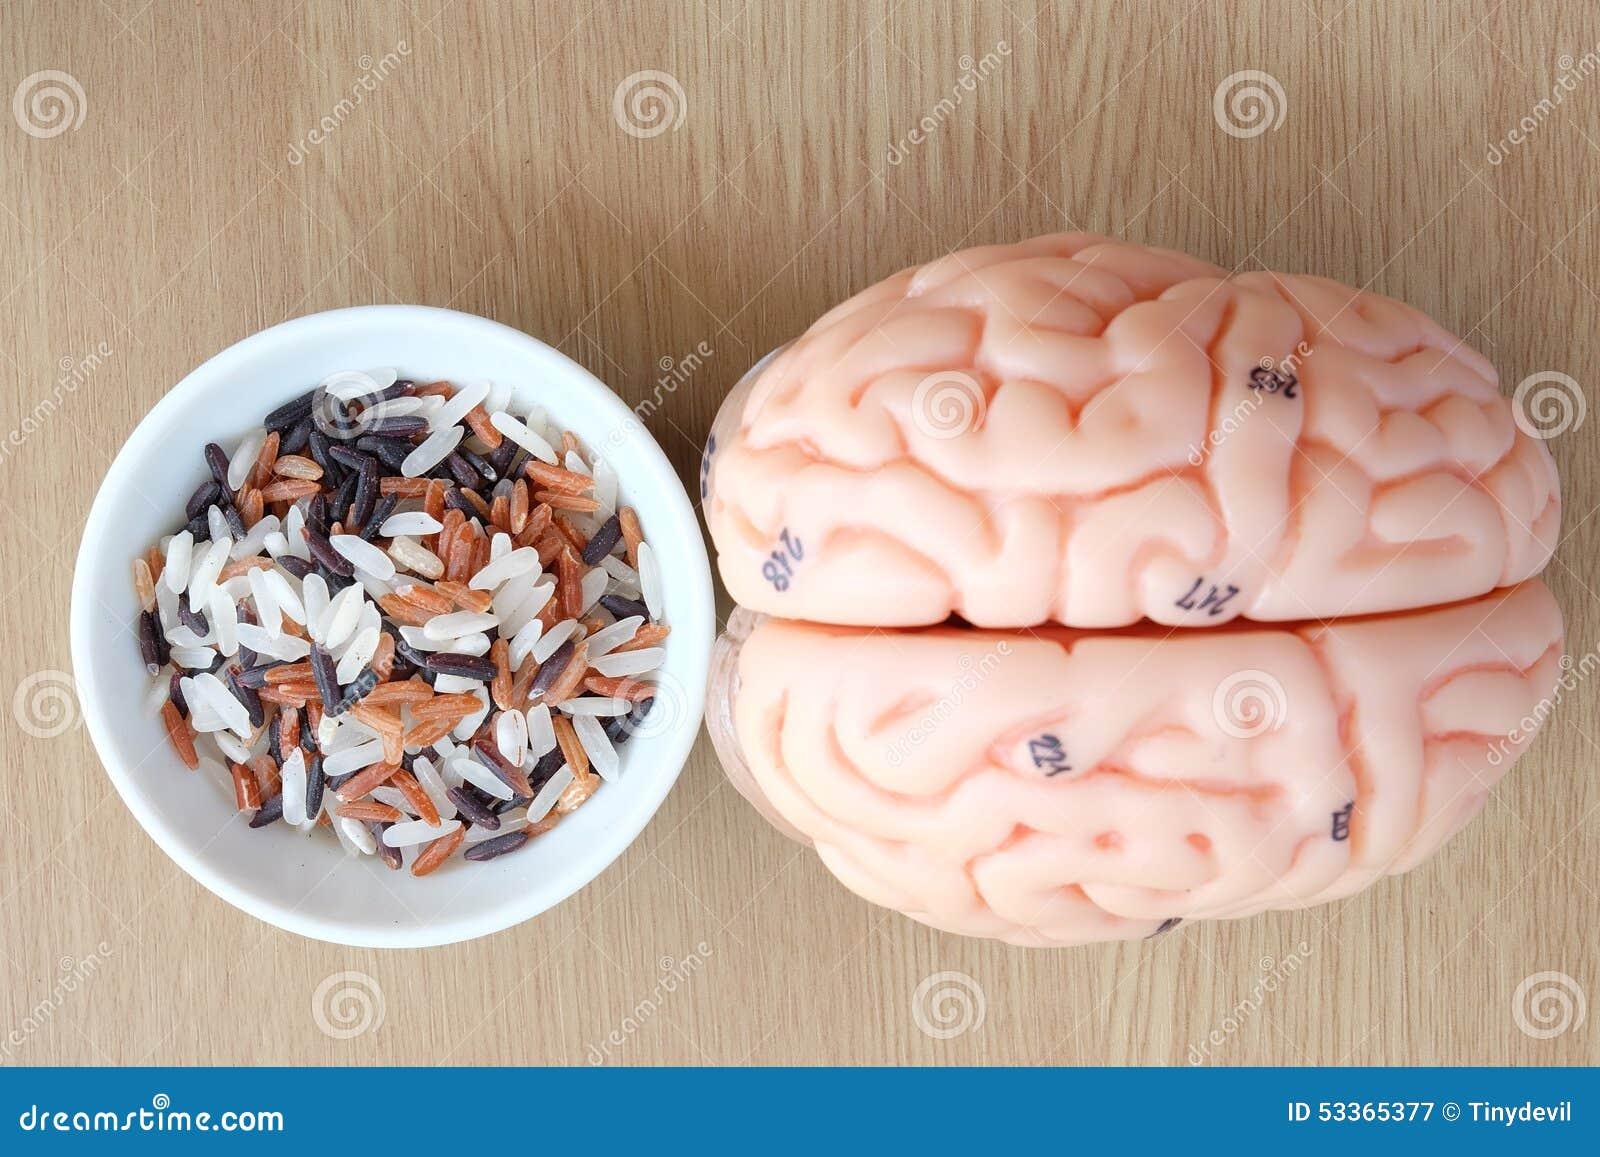 Human Brain Model Stock Image Image Of Intelligence 53365377